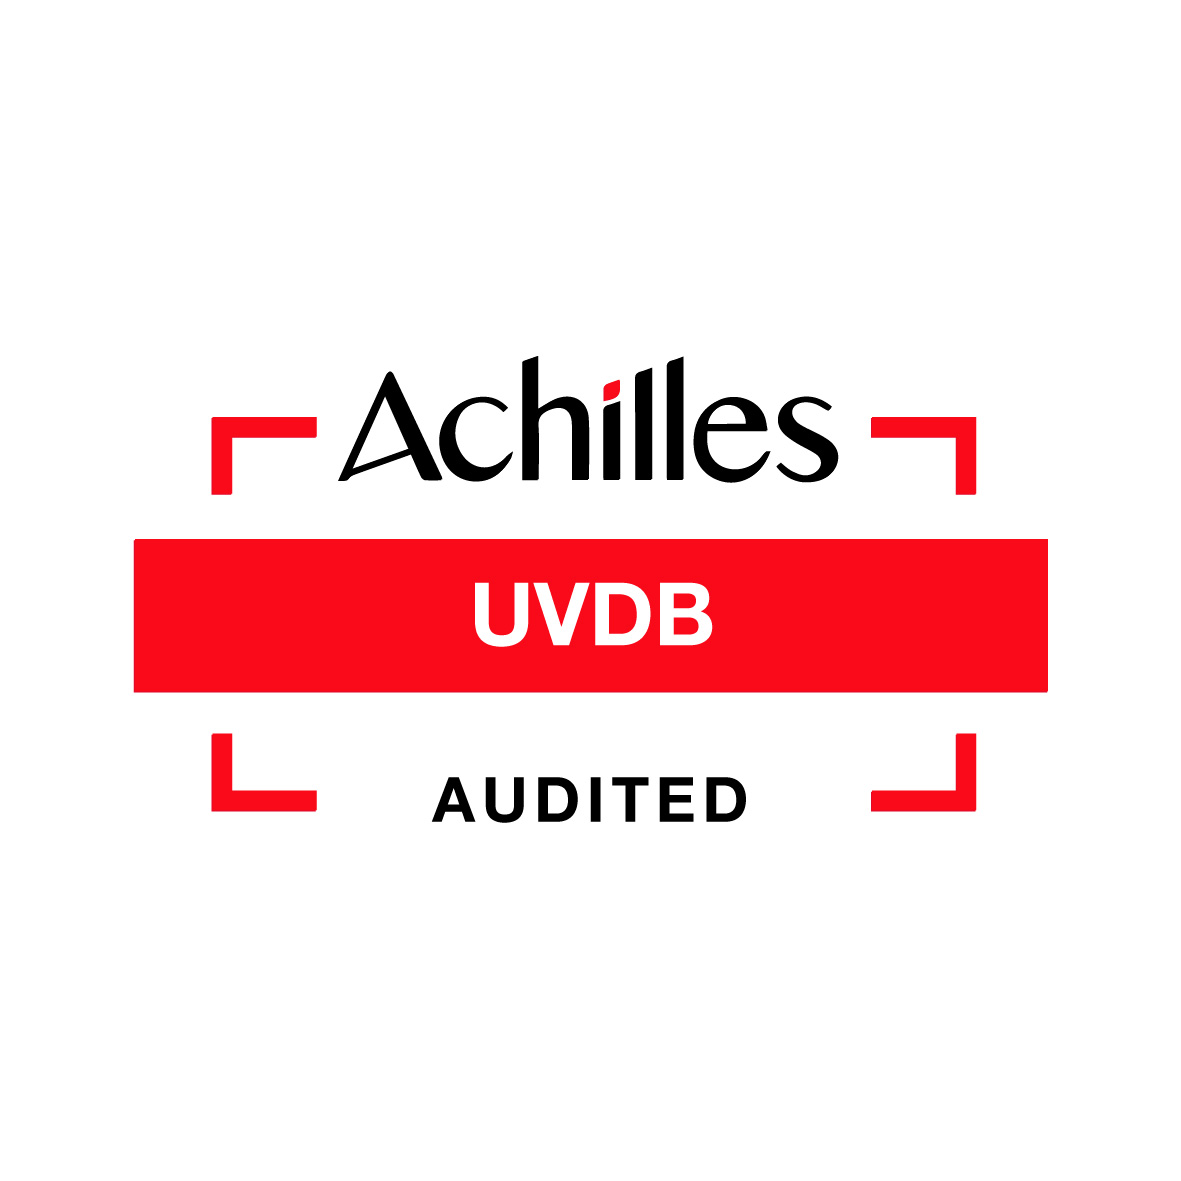 Achilles UVDB Audited logo